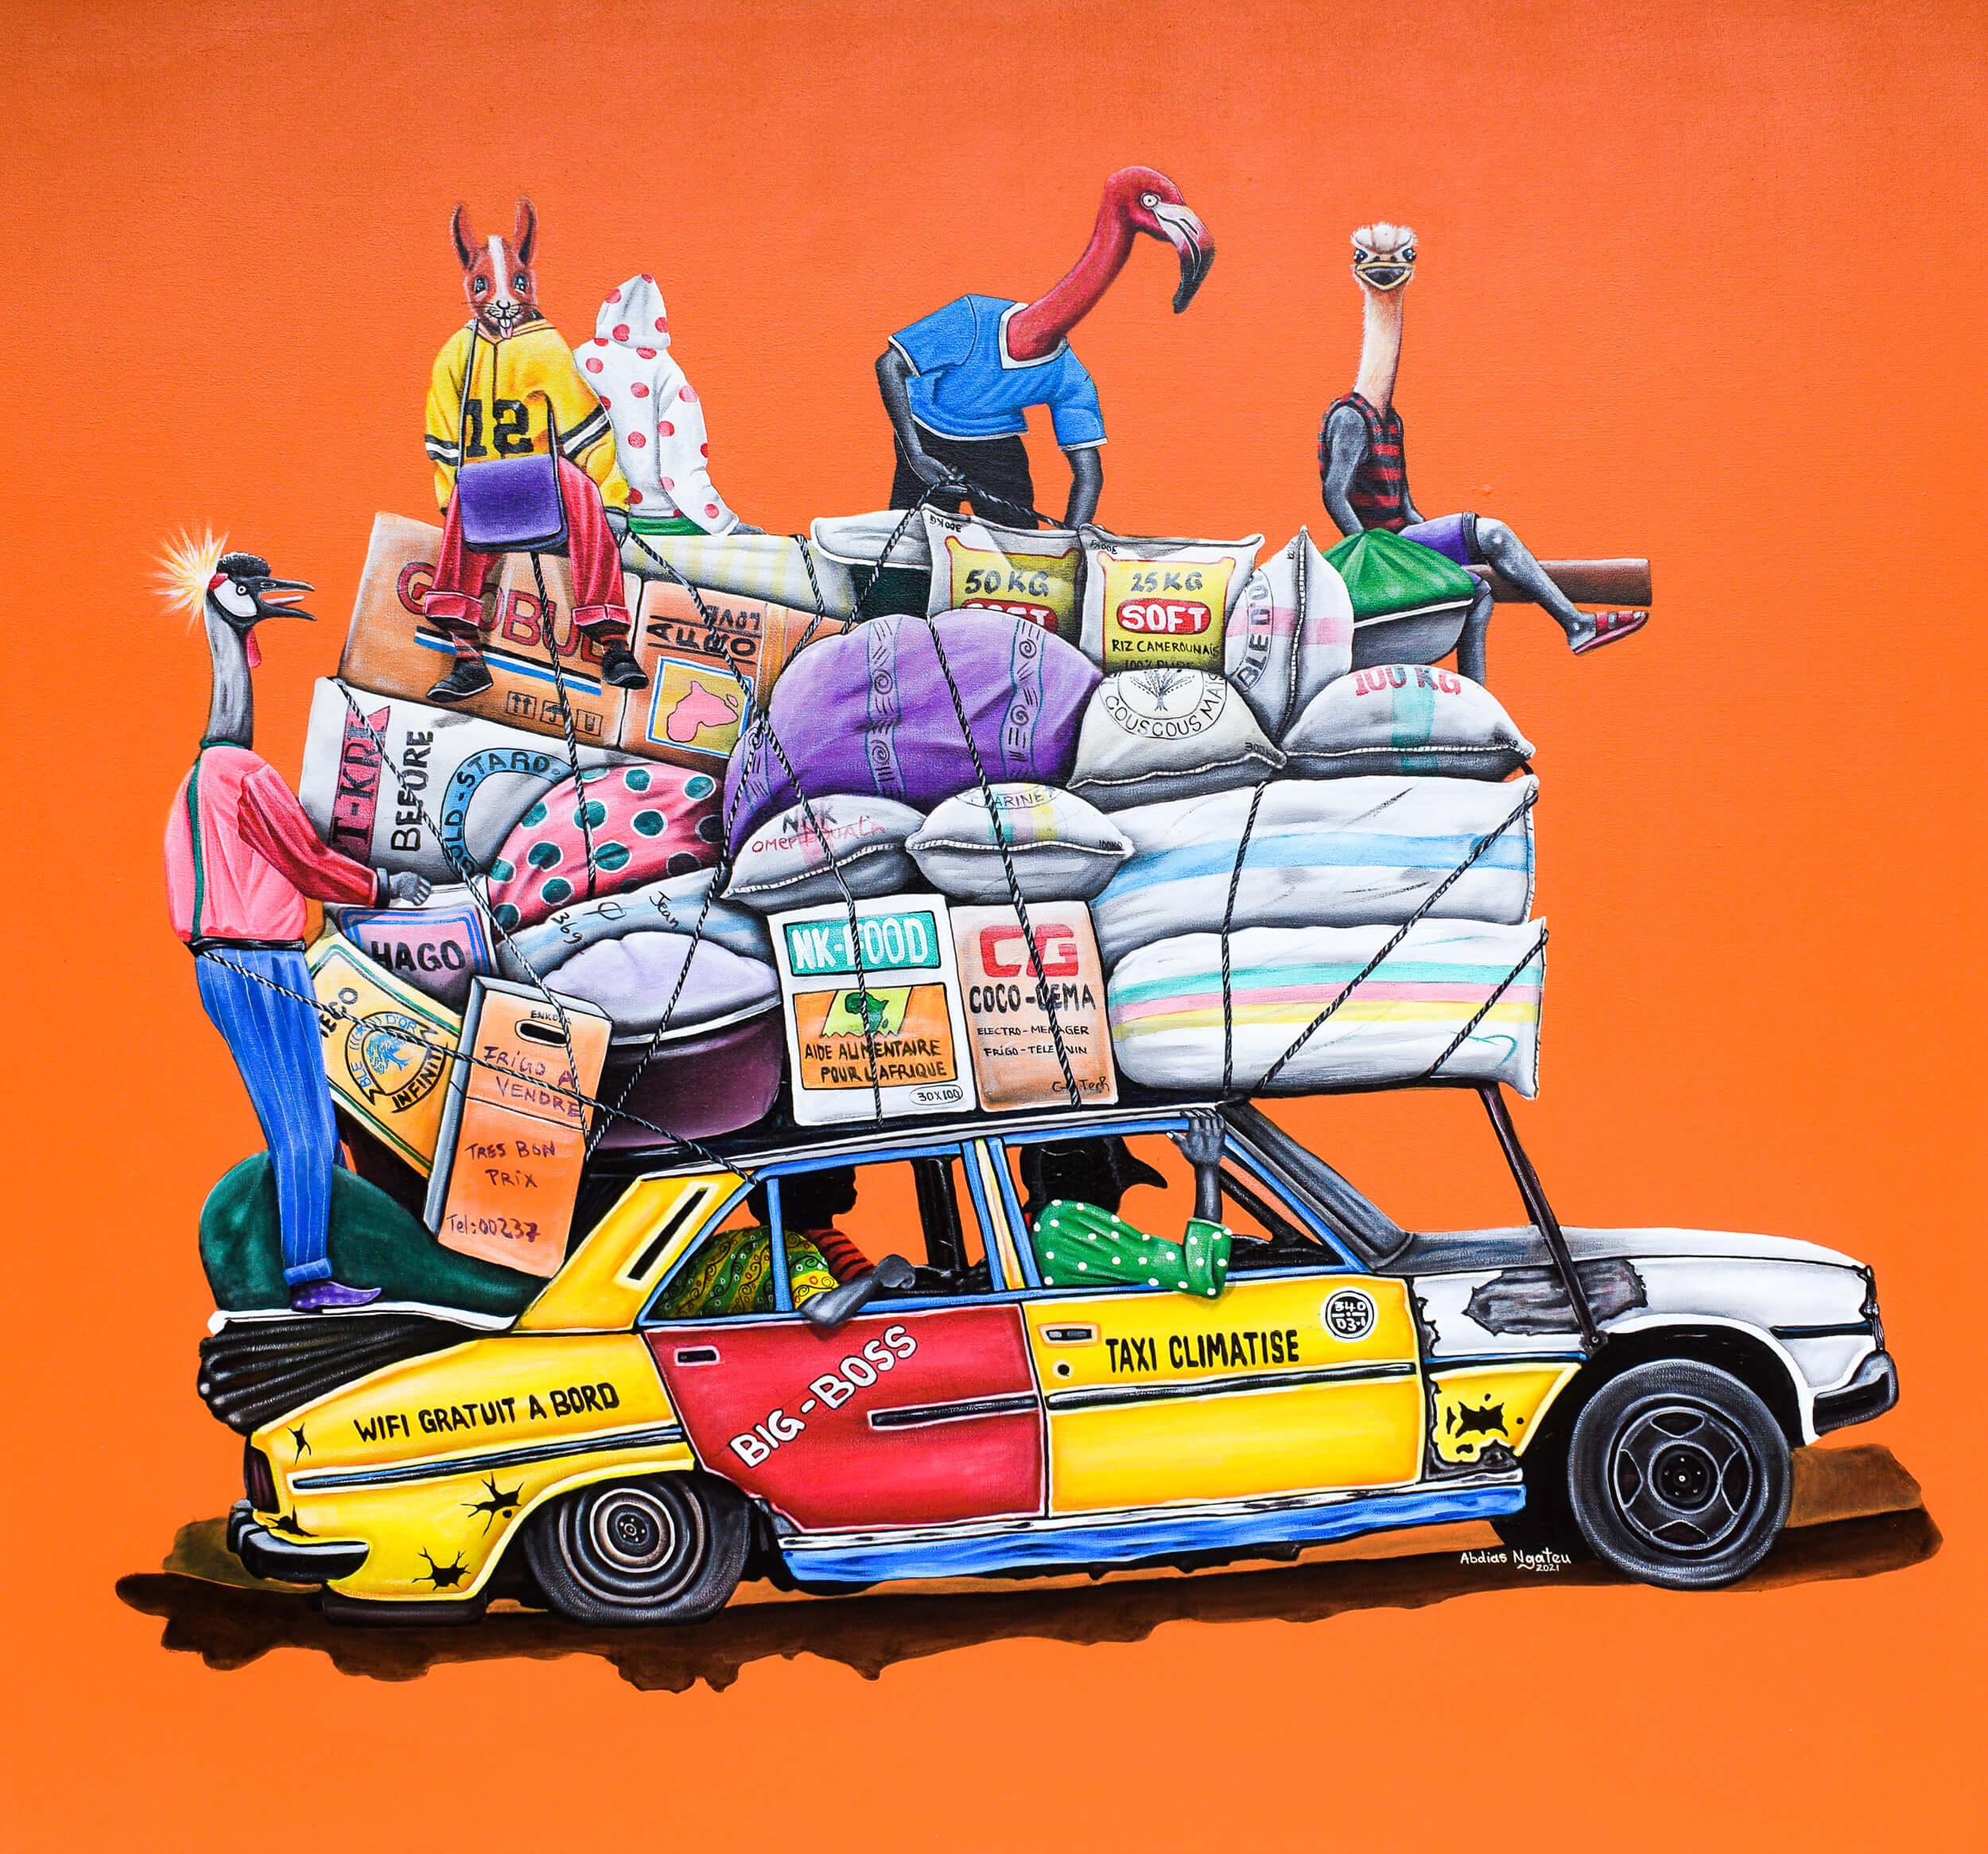 artsy-Abdias Ngateu - Taxi climatisé - 2021 - 120cm H x 130cm W - Acrylic on canvas - Courtesy by OOA Gallery-Modifier-2103